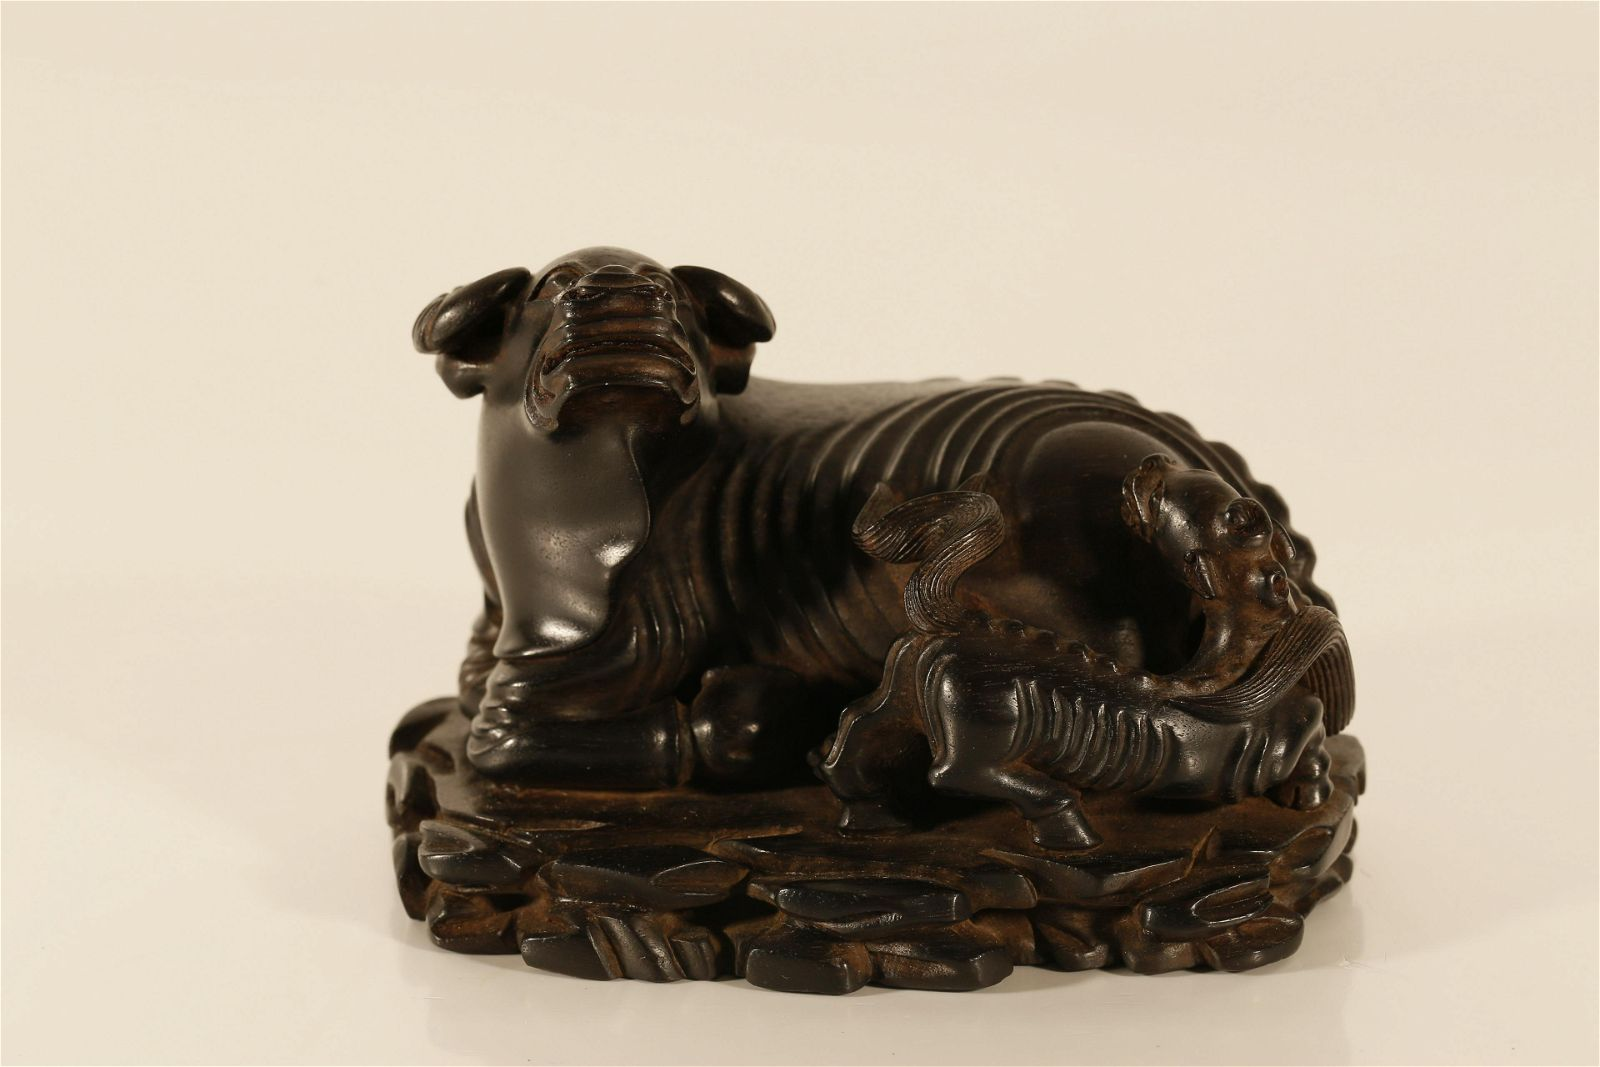 A Fine Zitan Wood 'Mythical Beast' Ornament